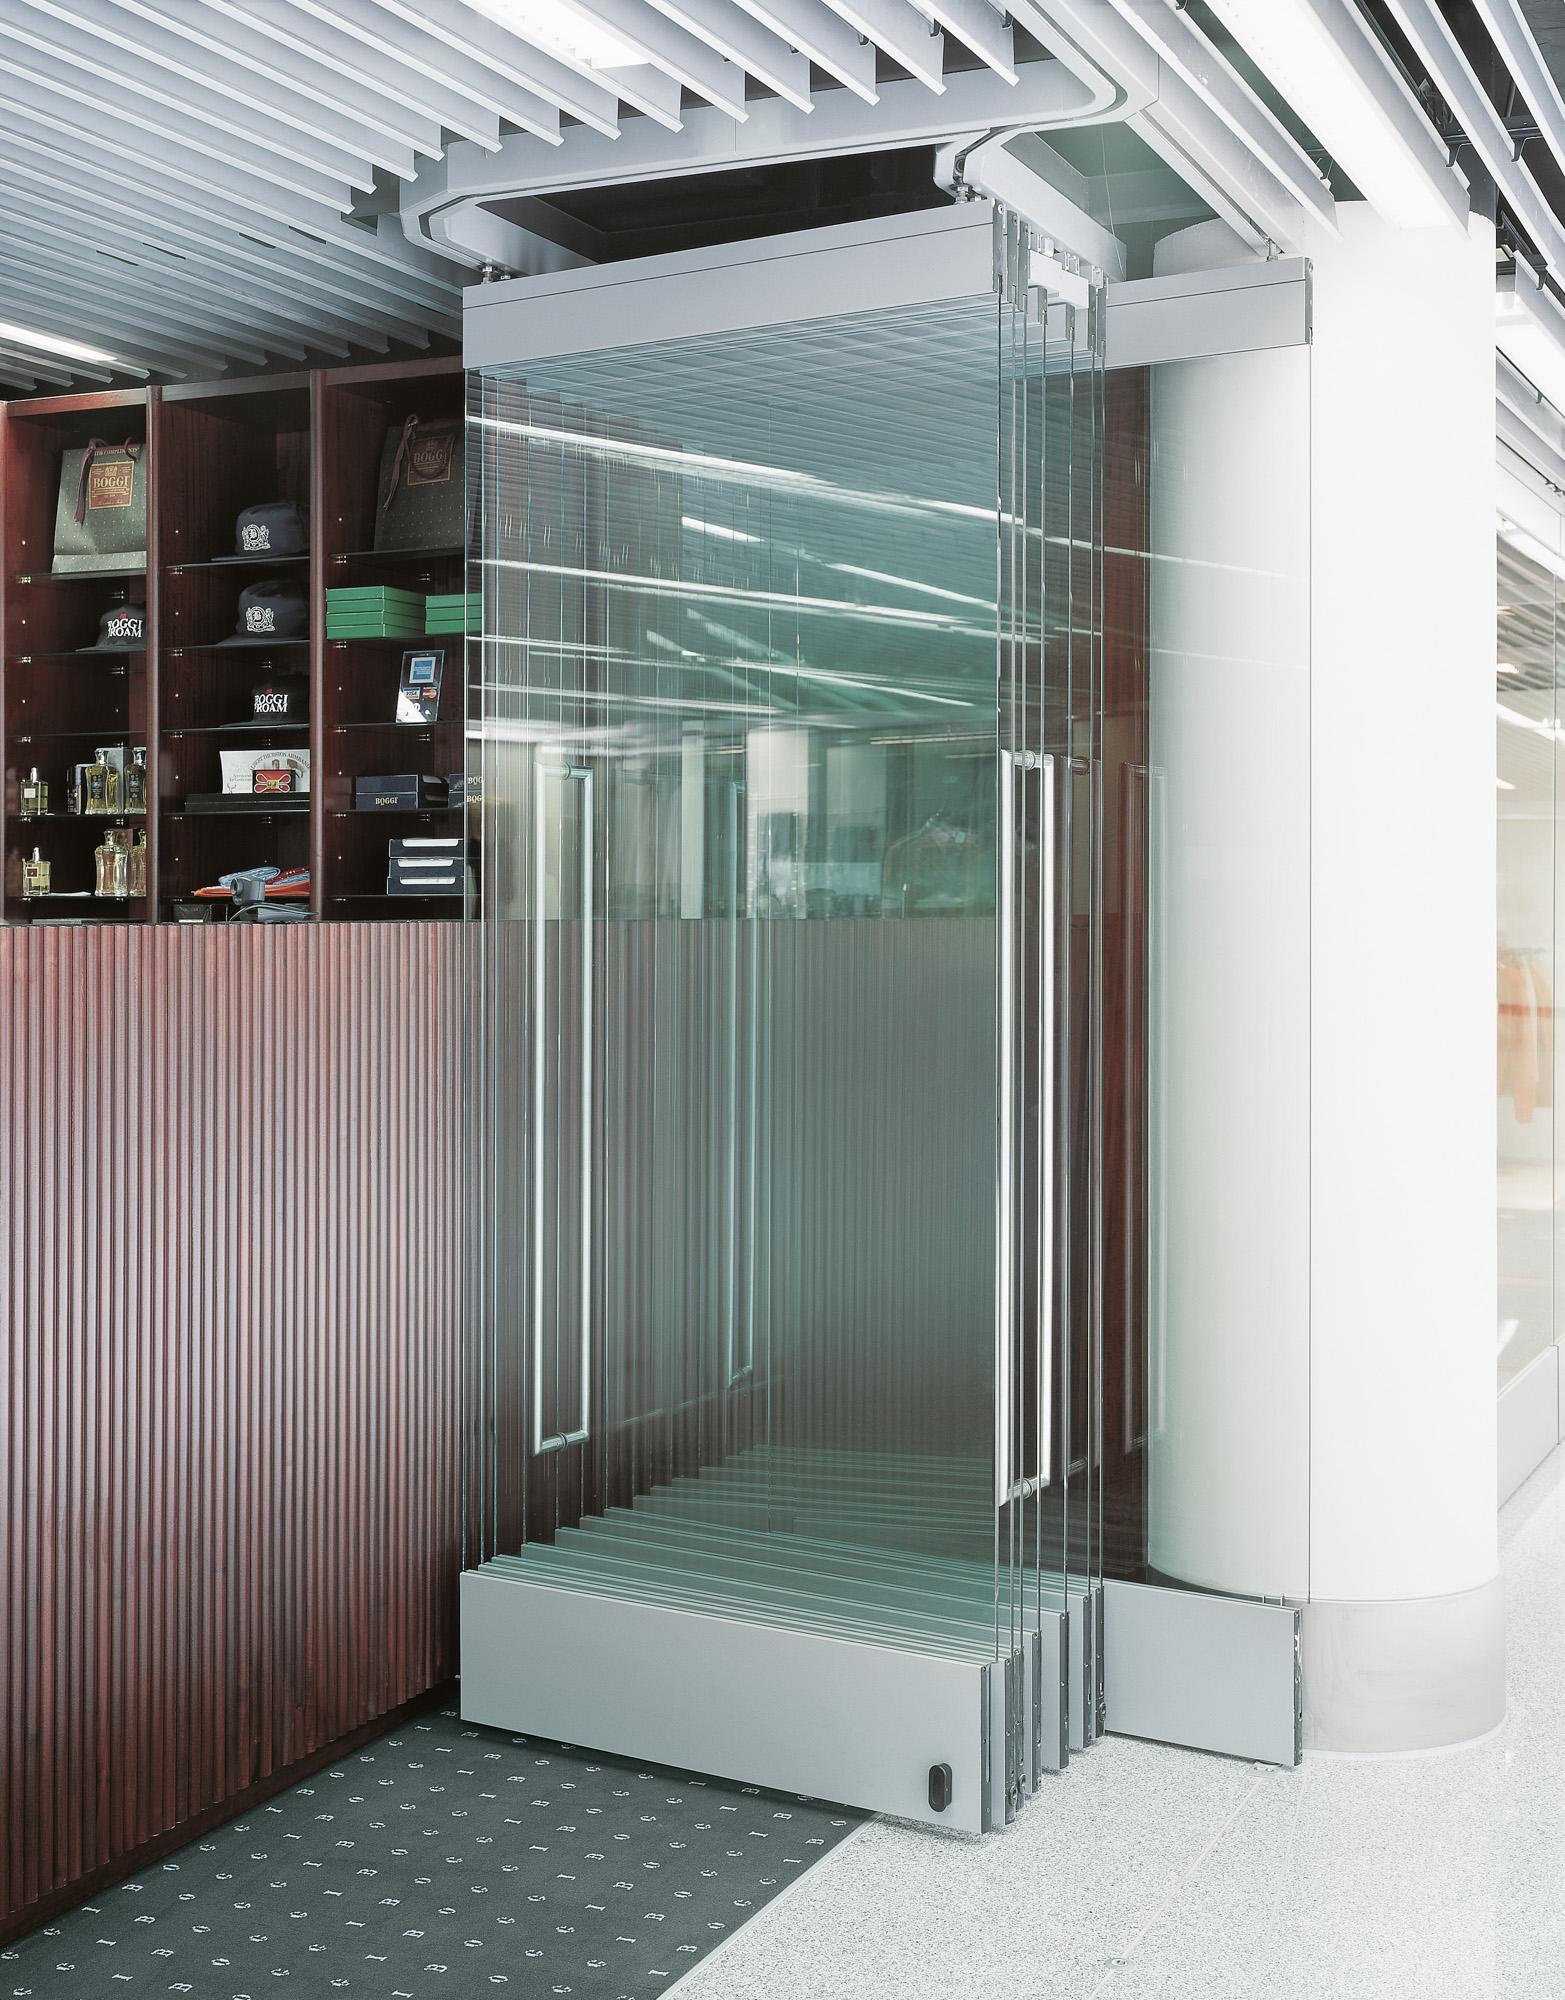 HUMA Metallbearbeitungs GmbH - Horizontale Schiebewände